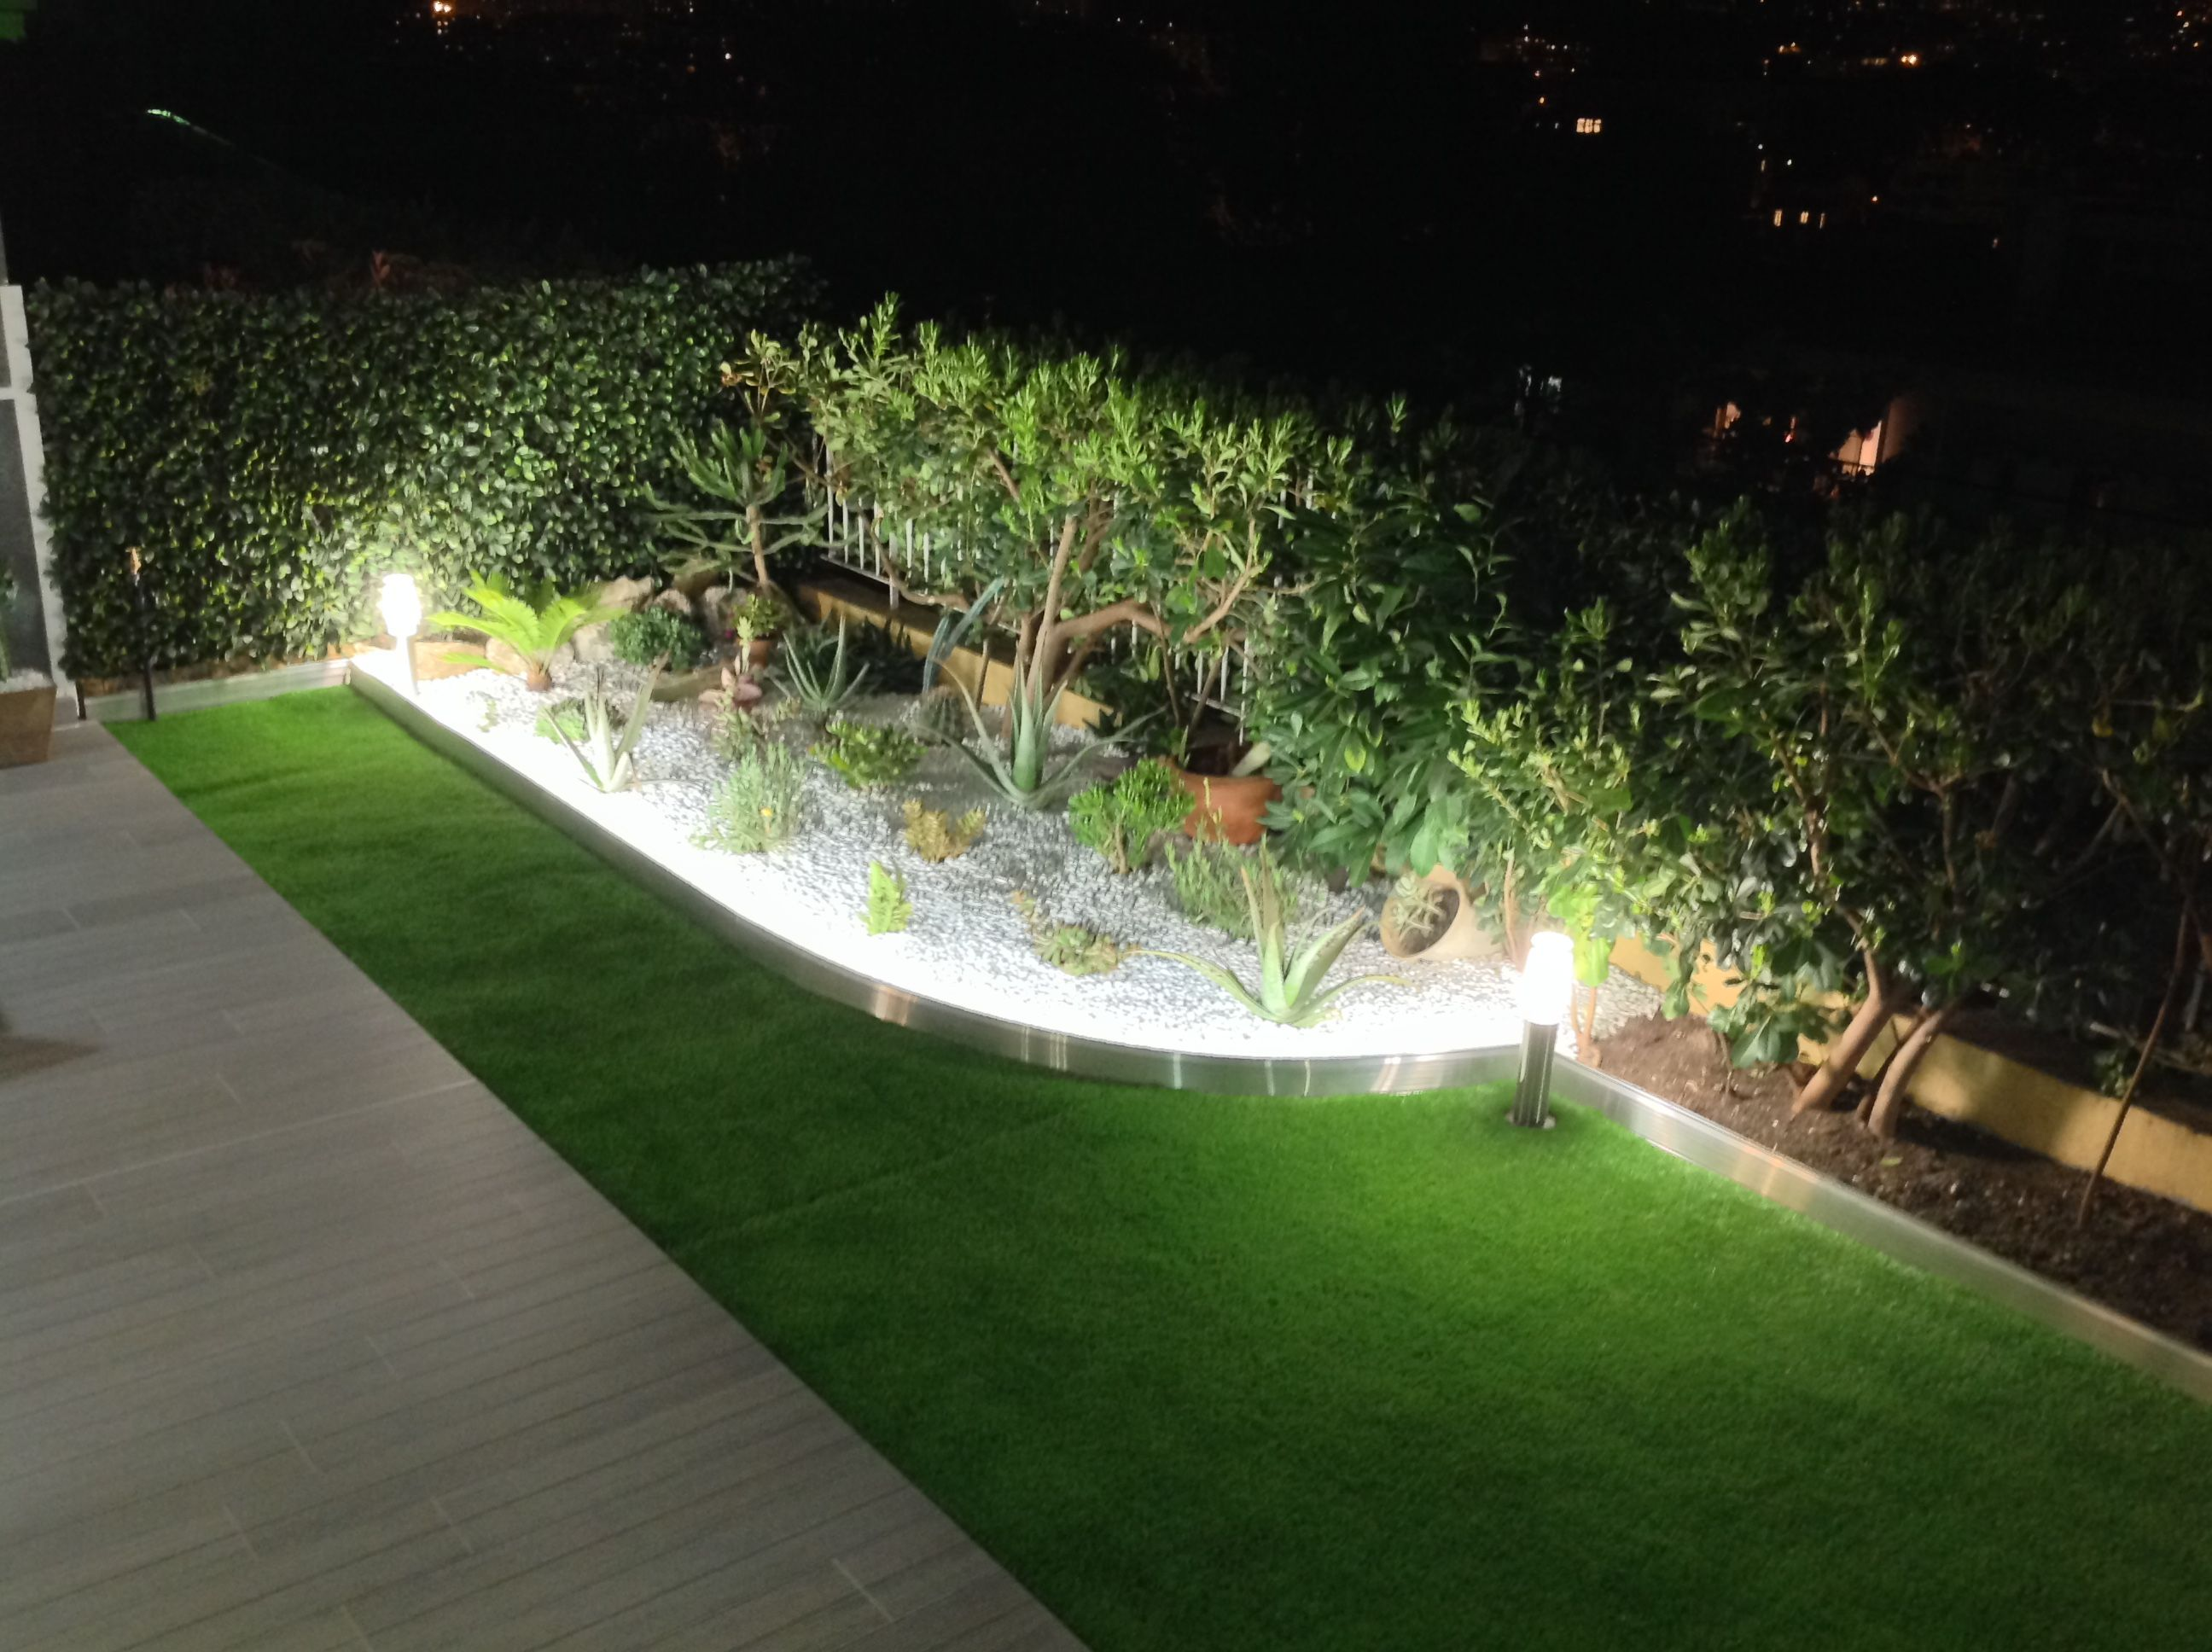 bordure de jardin en aluminium brut avec clairage led